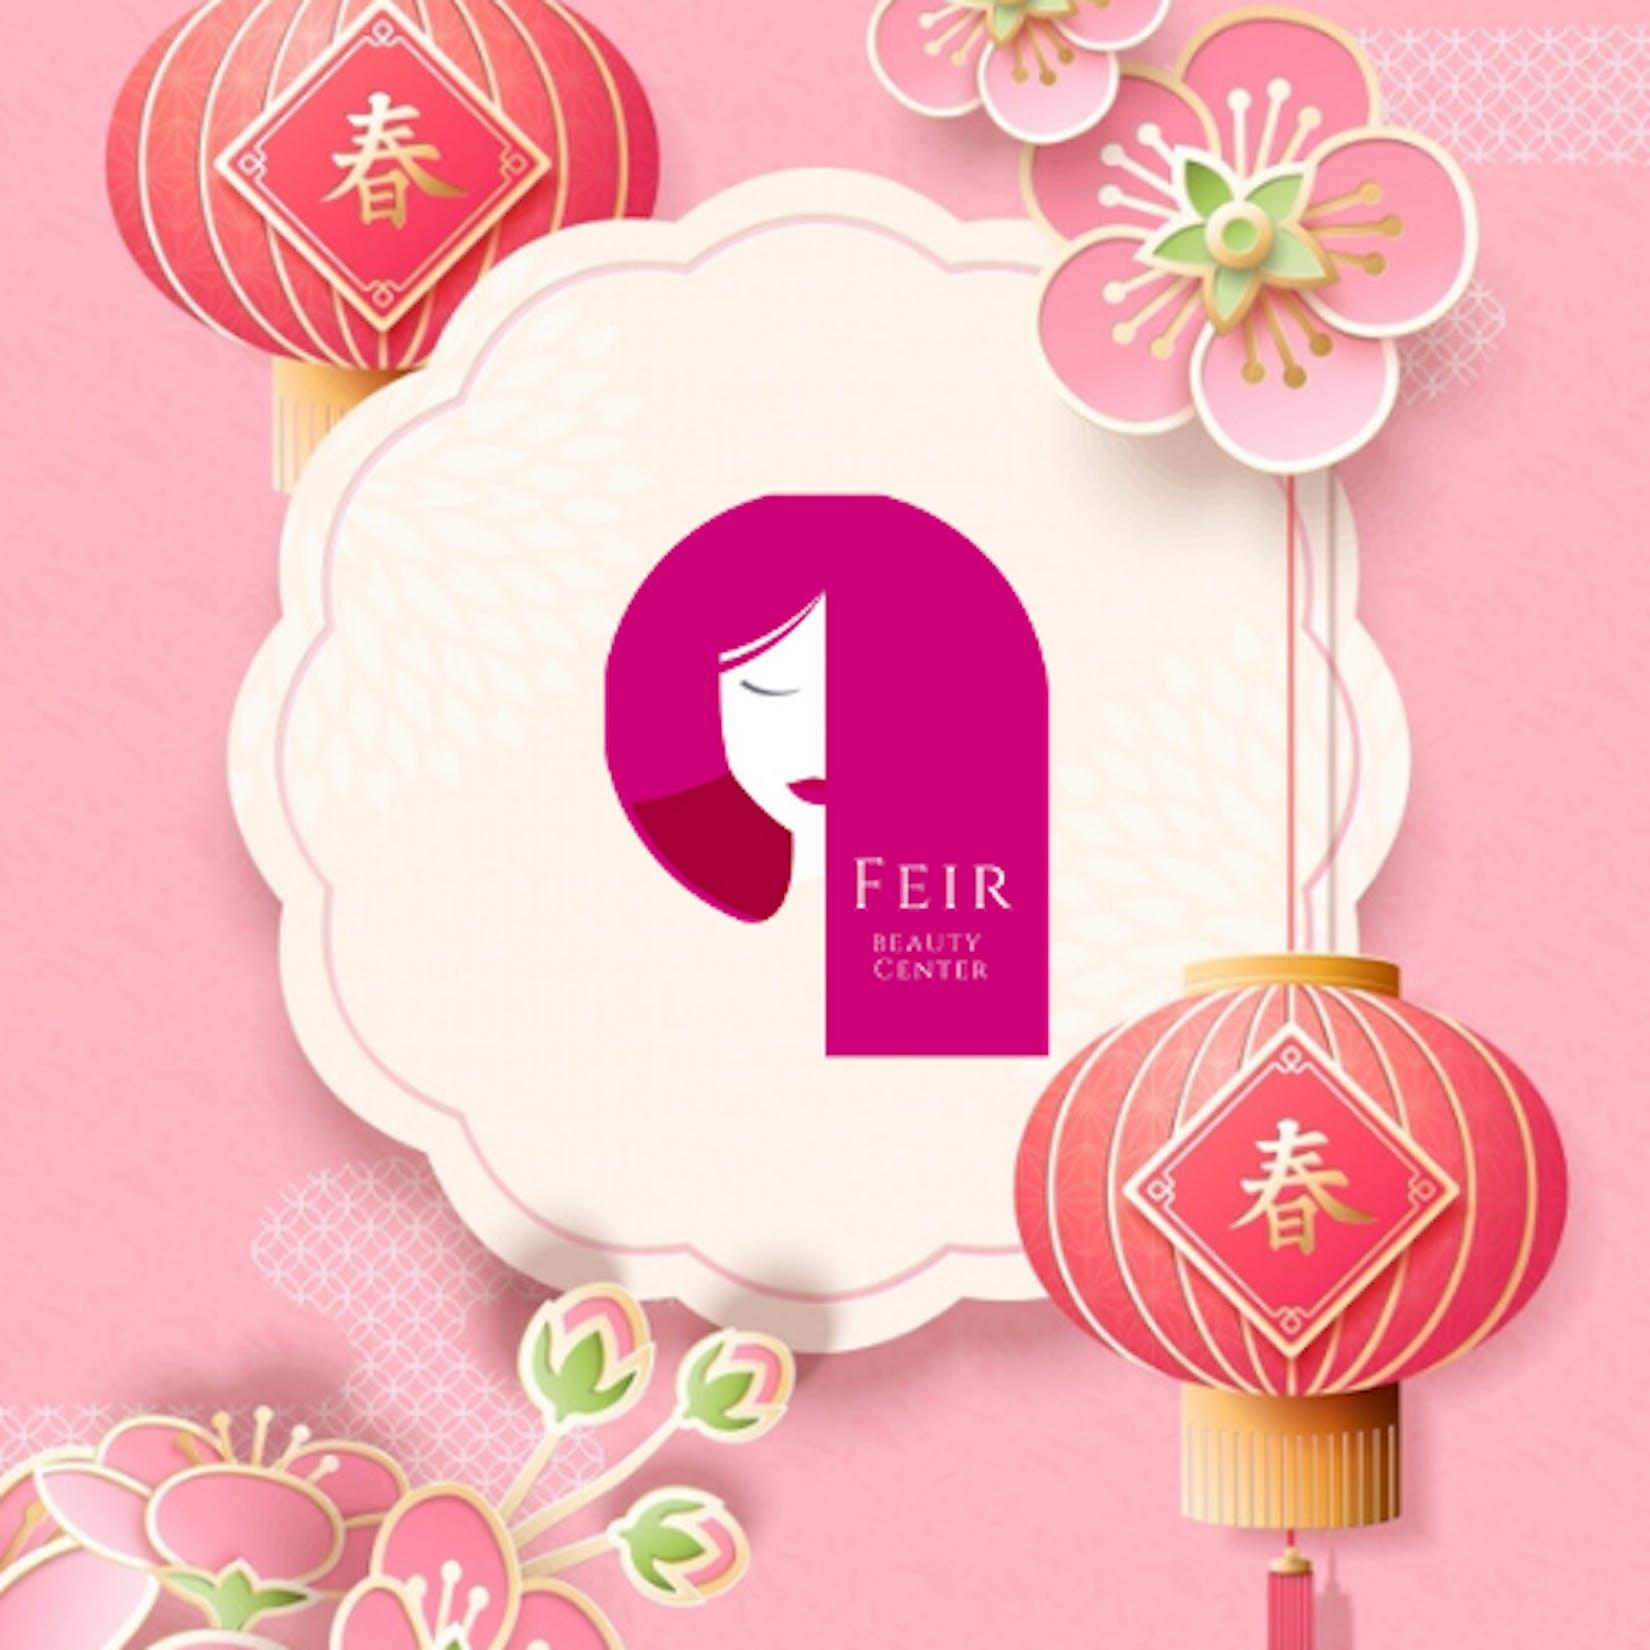 Feir Beauty Service | Beauty